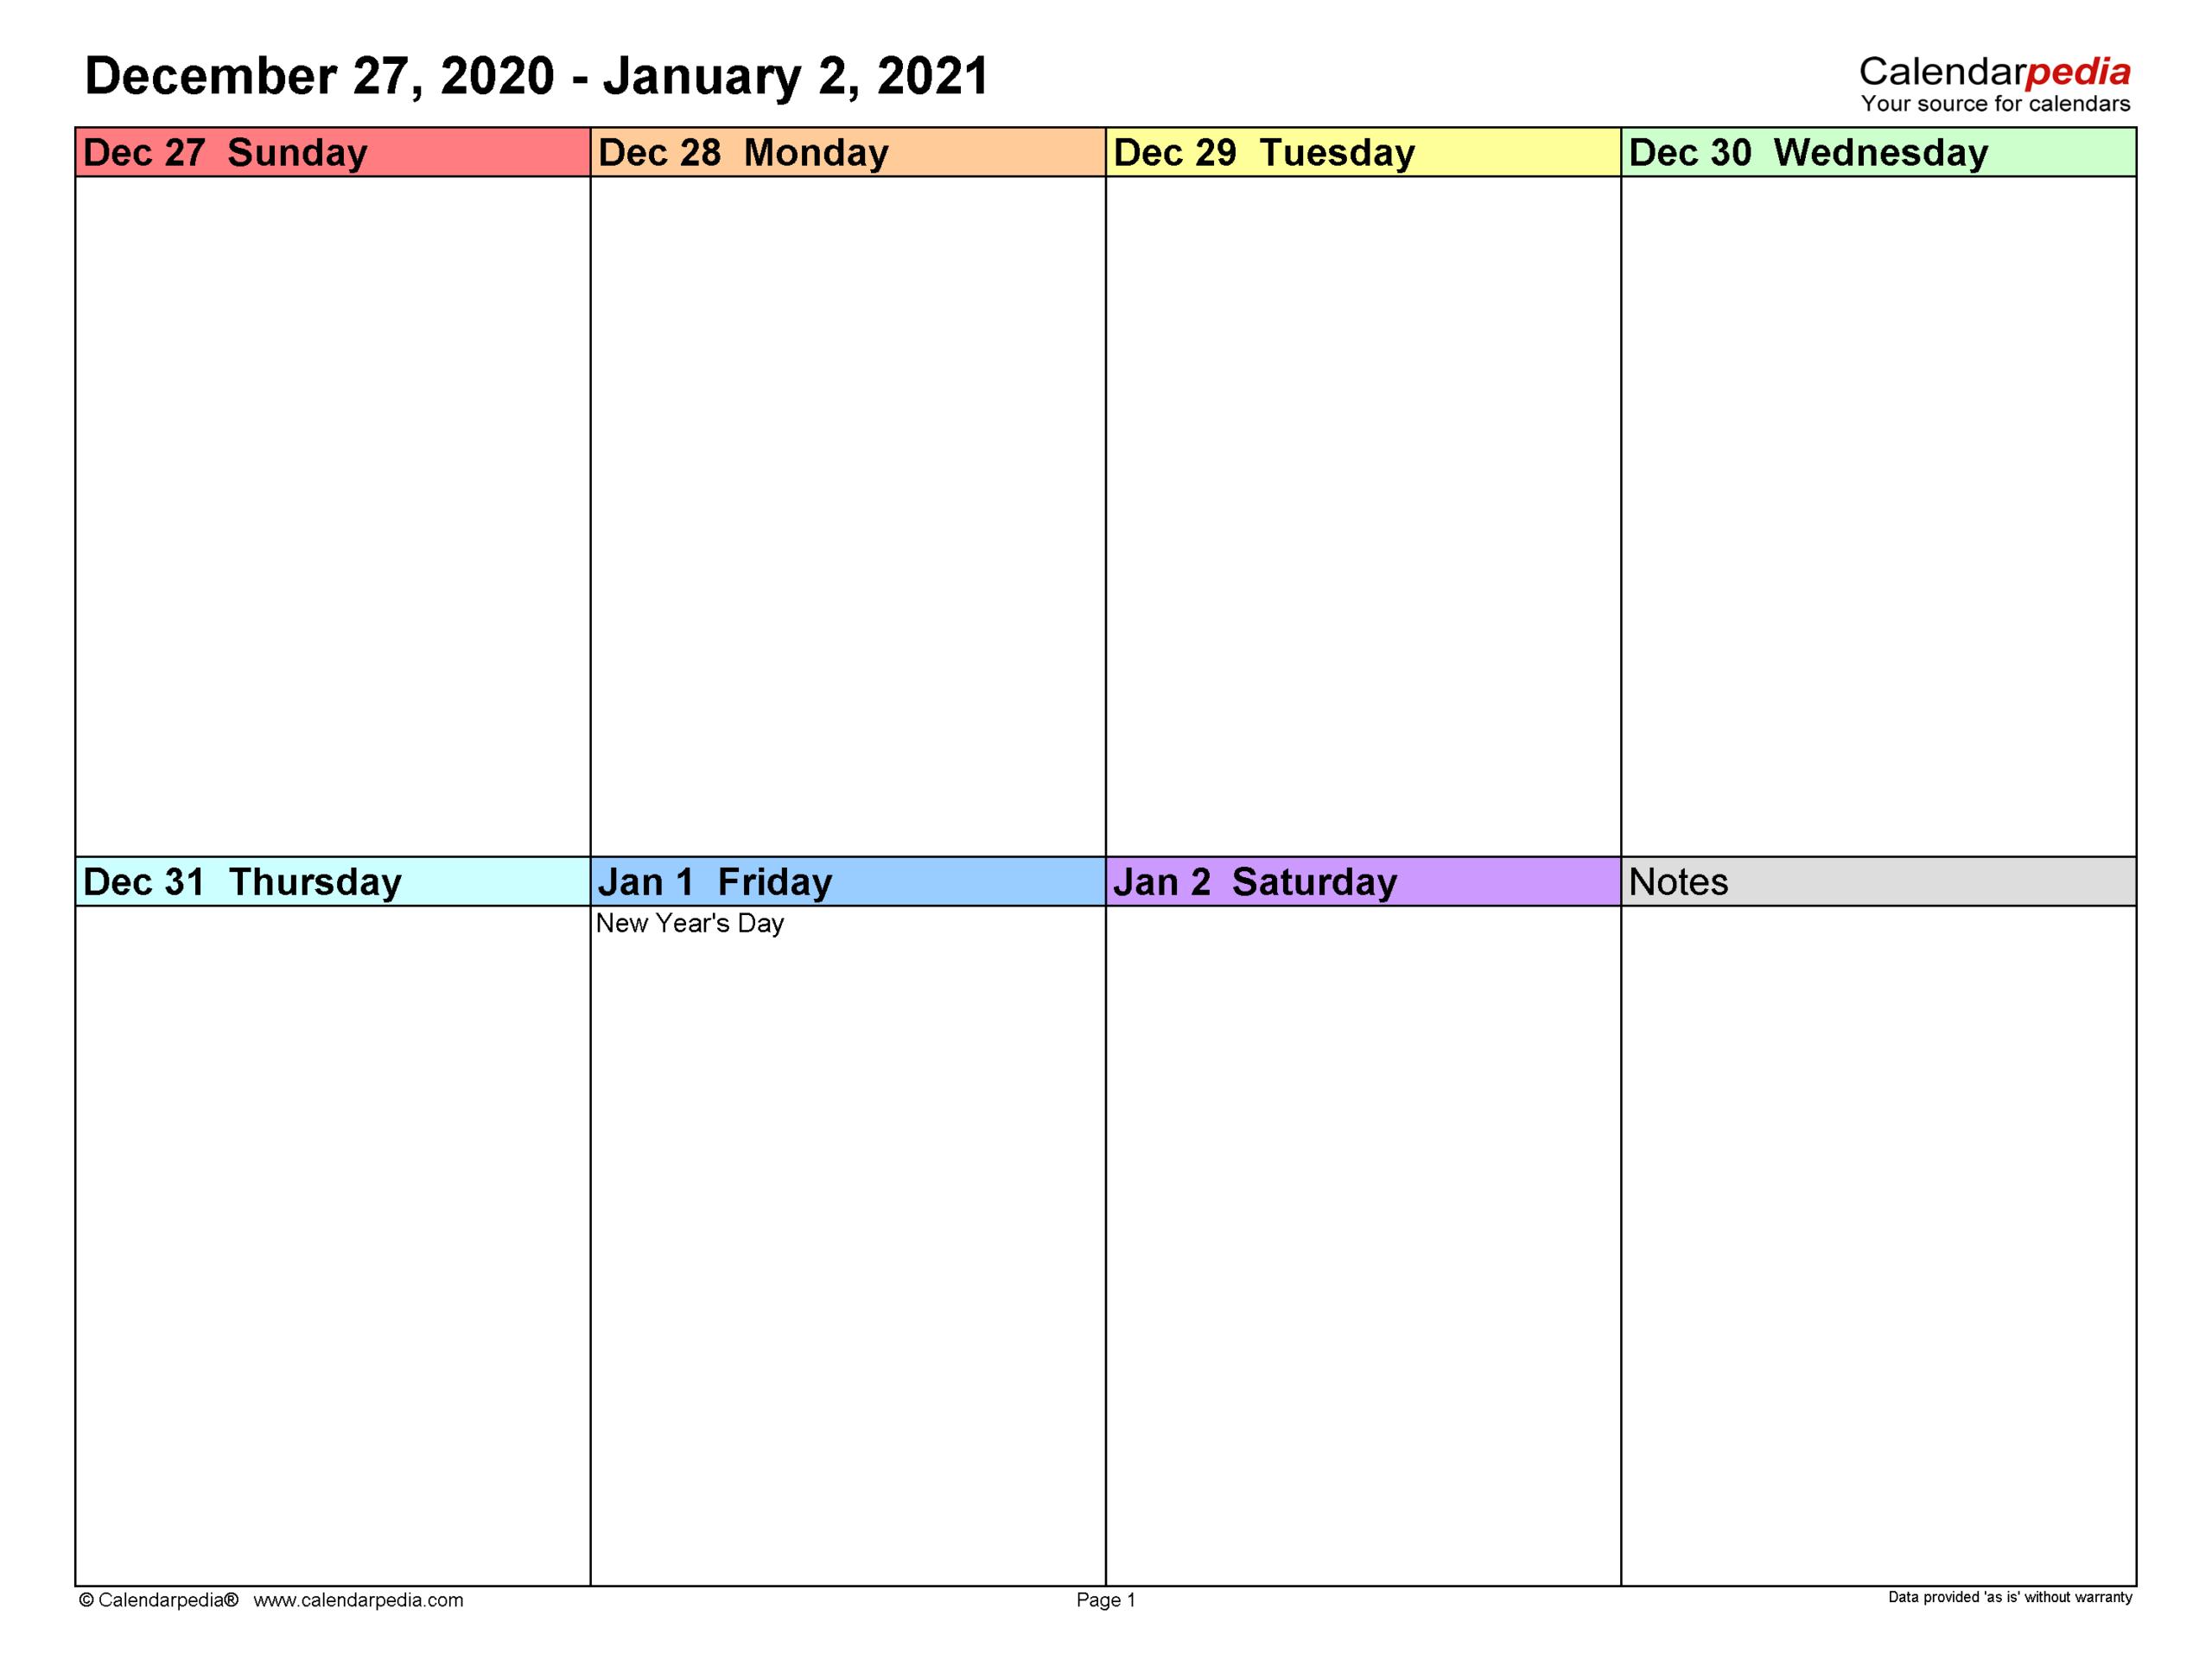 Weekly Calendars 2021 For Word - 12 Free Printable Templates within 2021 Planner: Weekly Calendar Planner